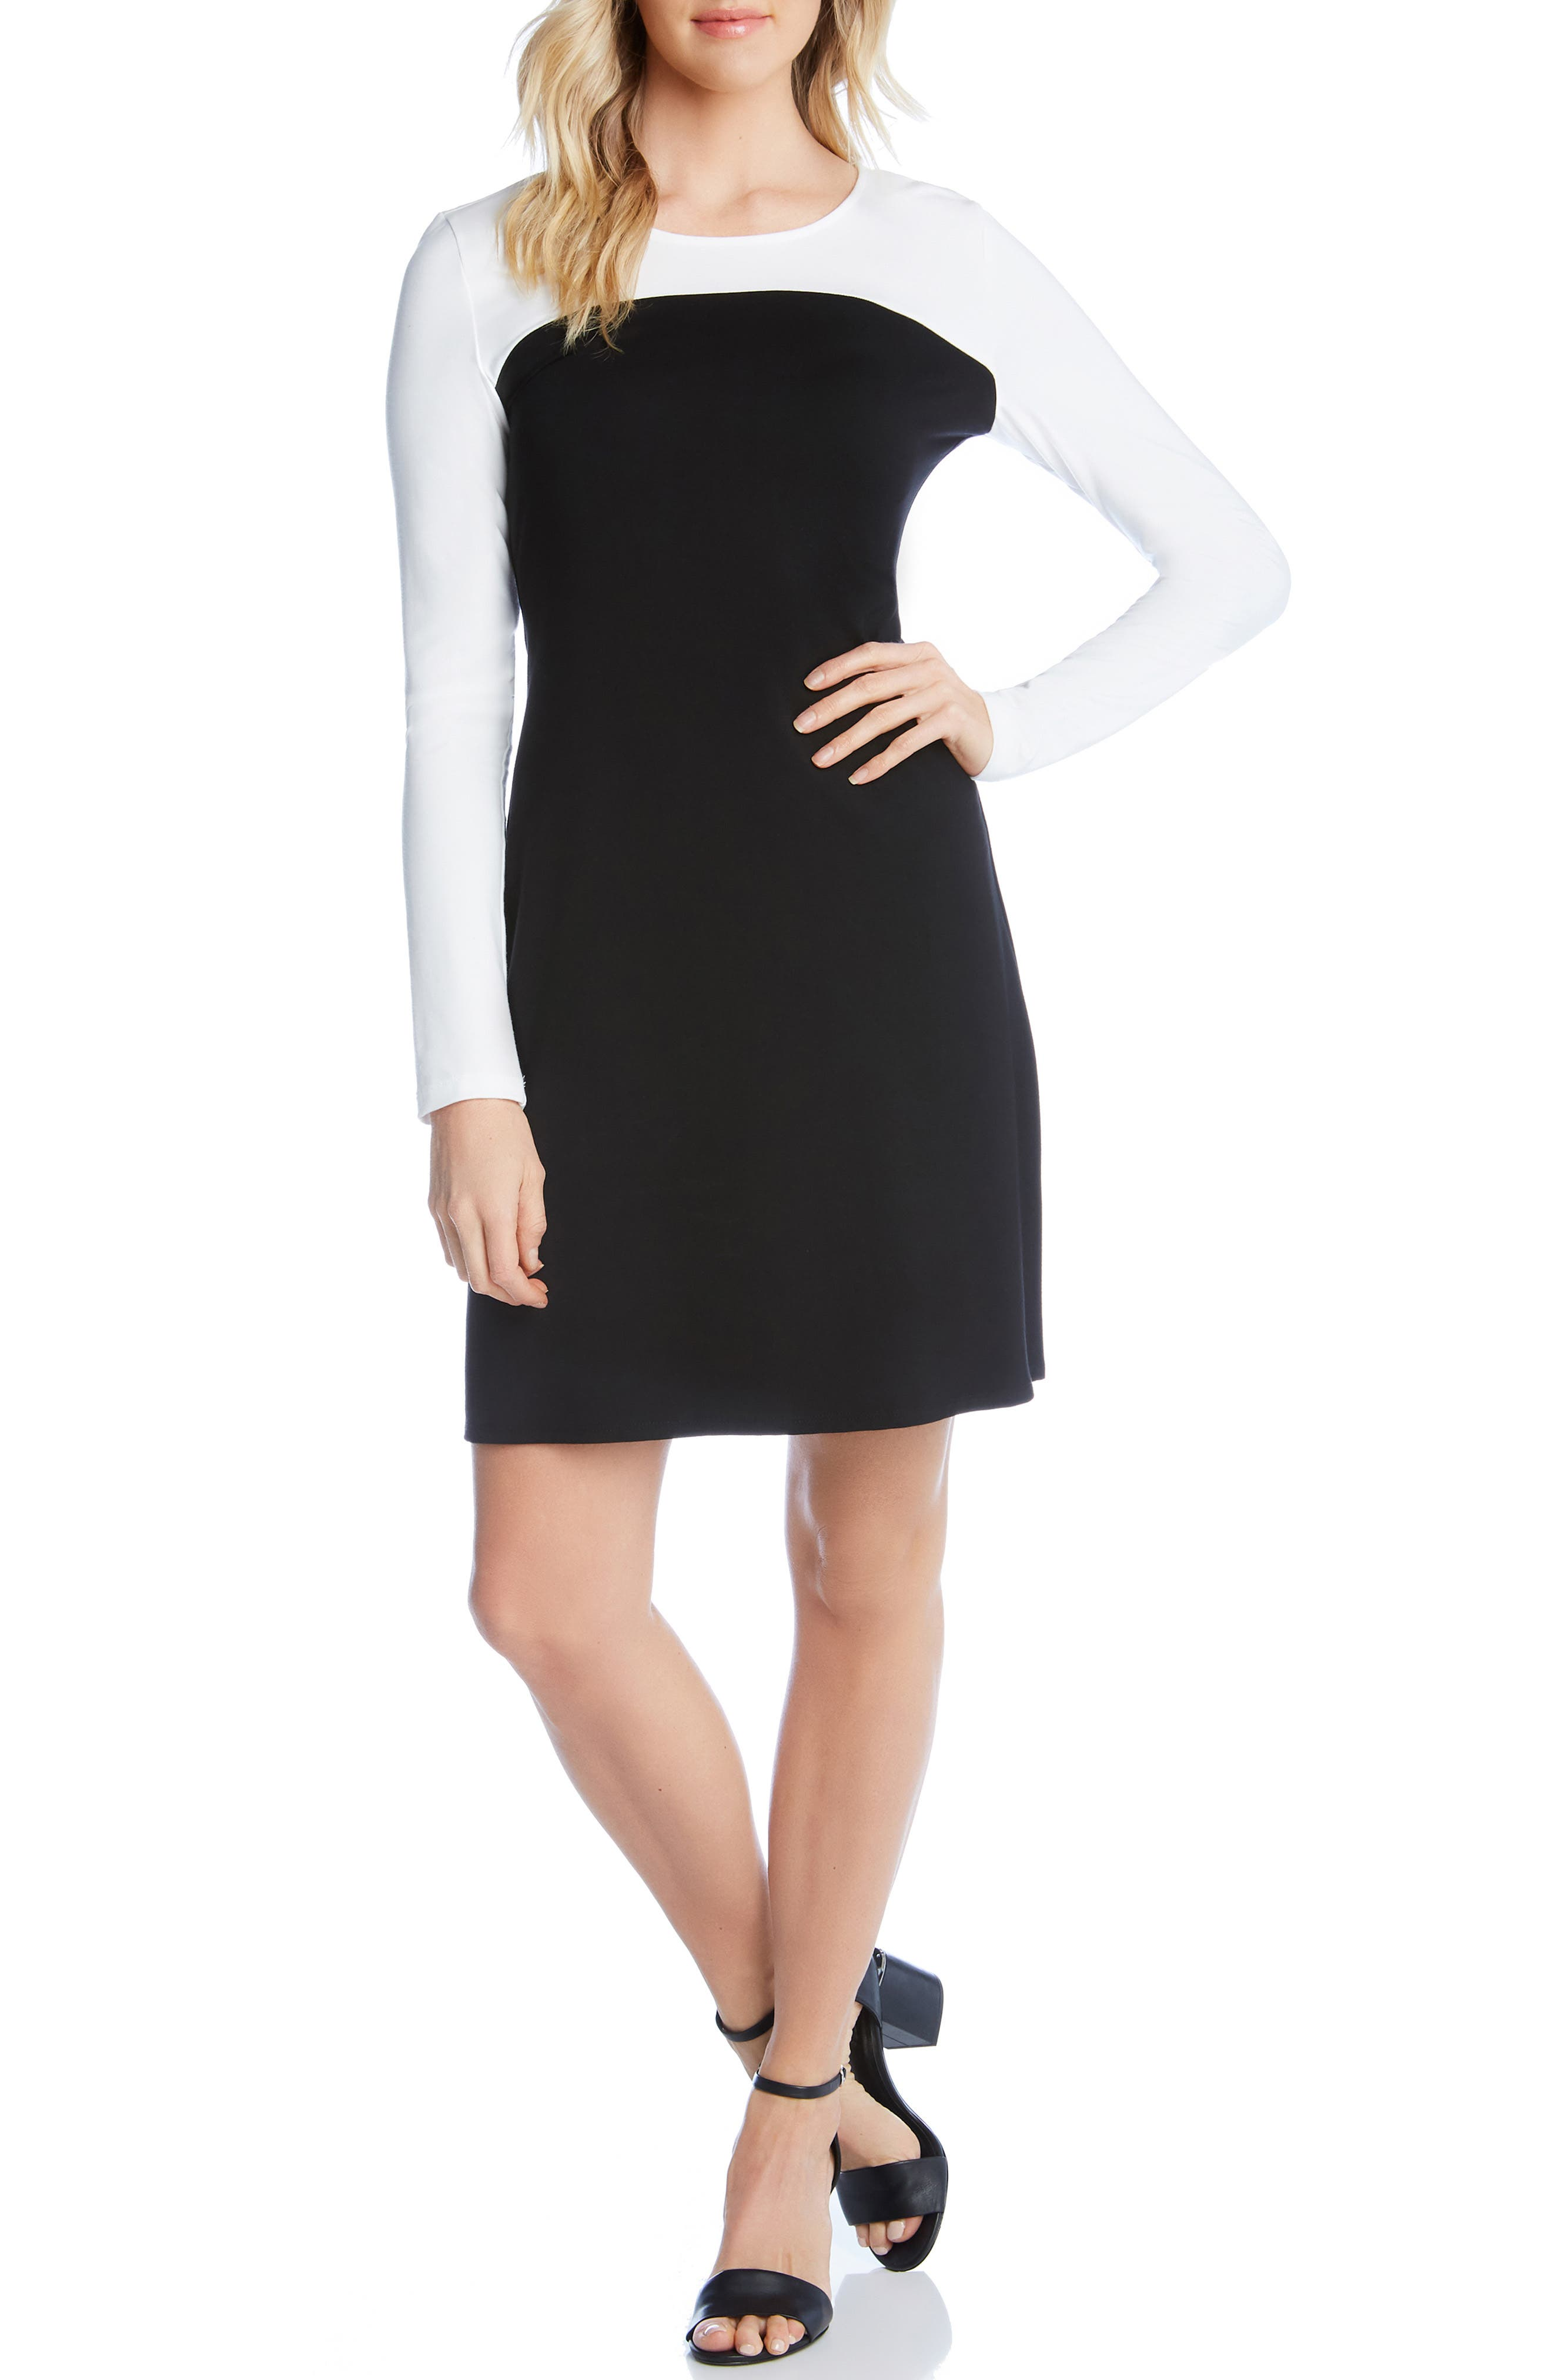 KAREN KANE, Colorblock Sheath Dress, Alternate thumbnail 4, color, BLACK WITH OFF WHITE